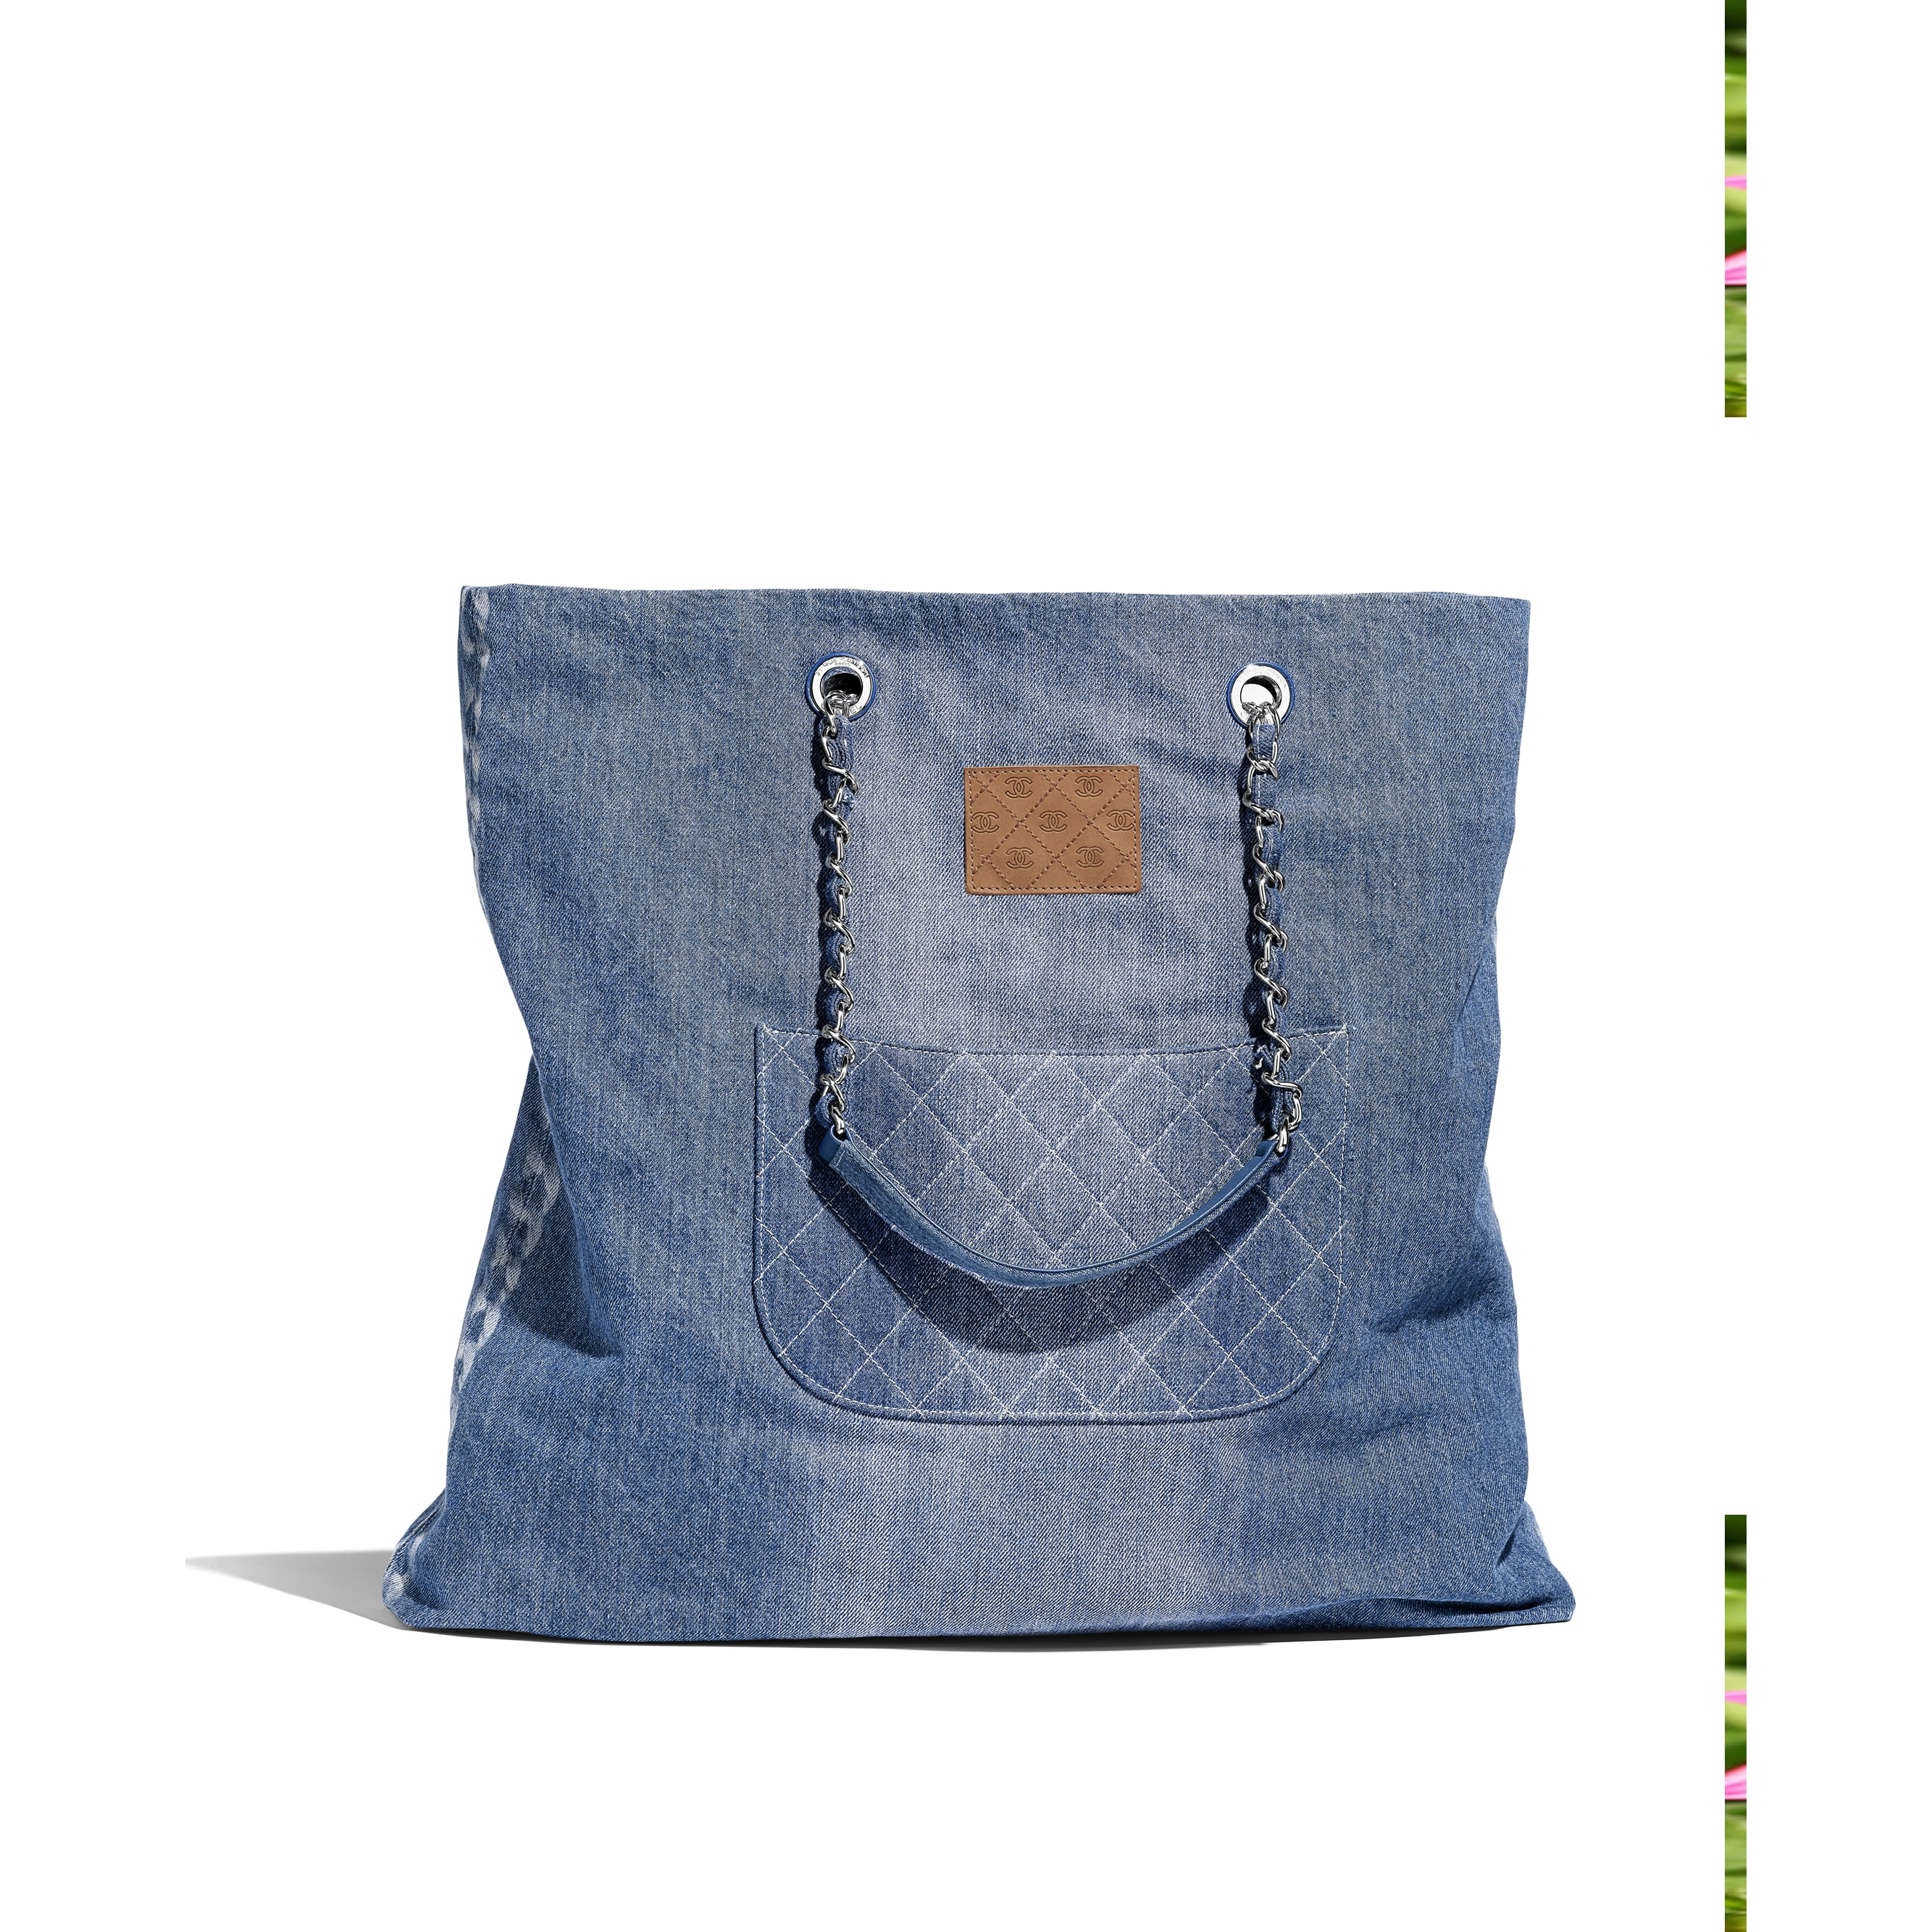 ... Large Shopping Bag - Blue - Printed Denim   Silver-Tone Metal -  Alternative view 70f3f9919a792